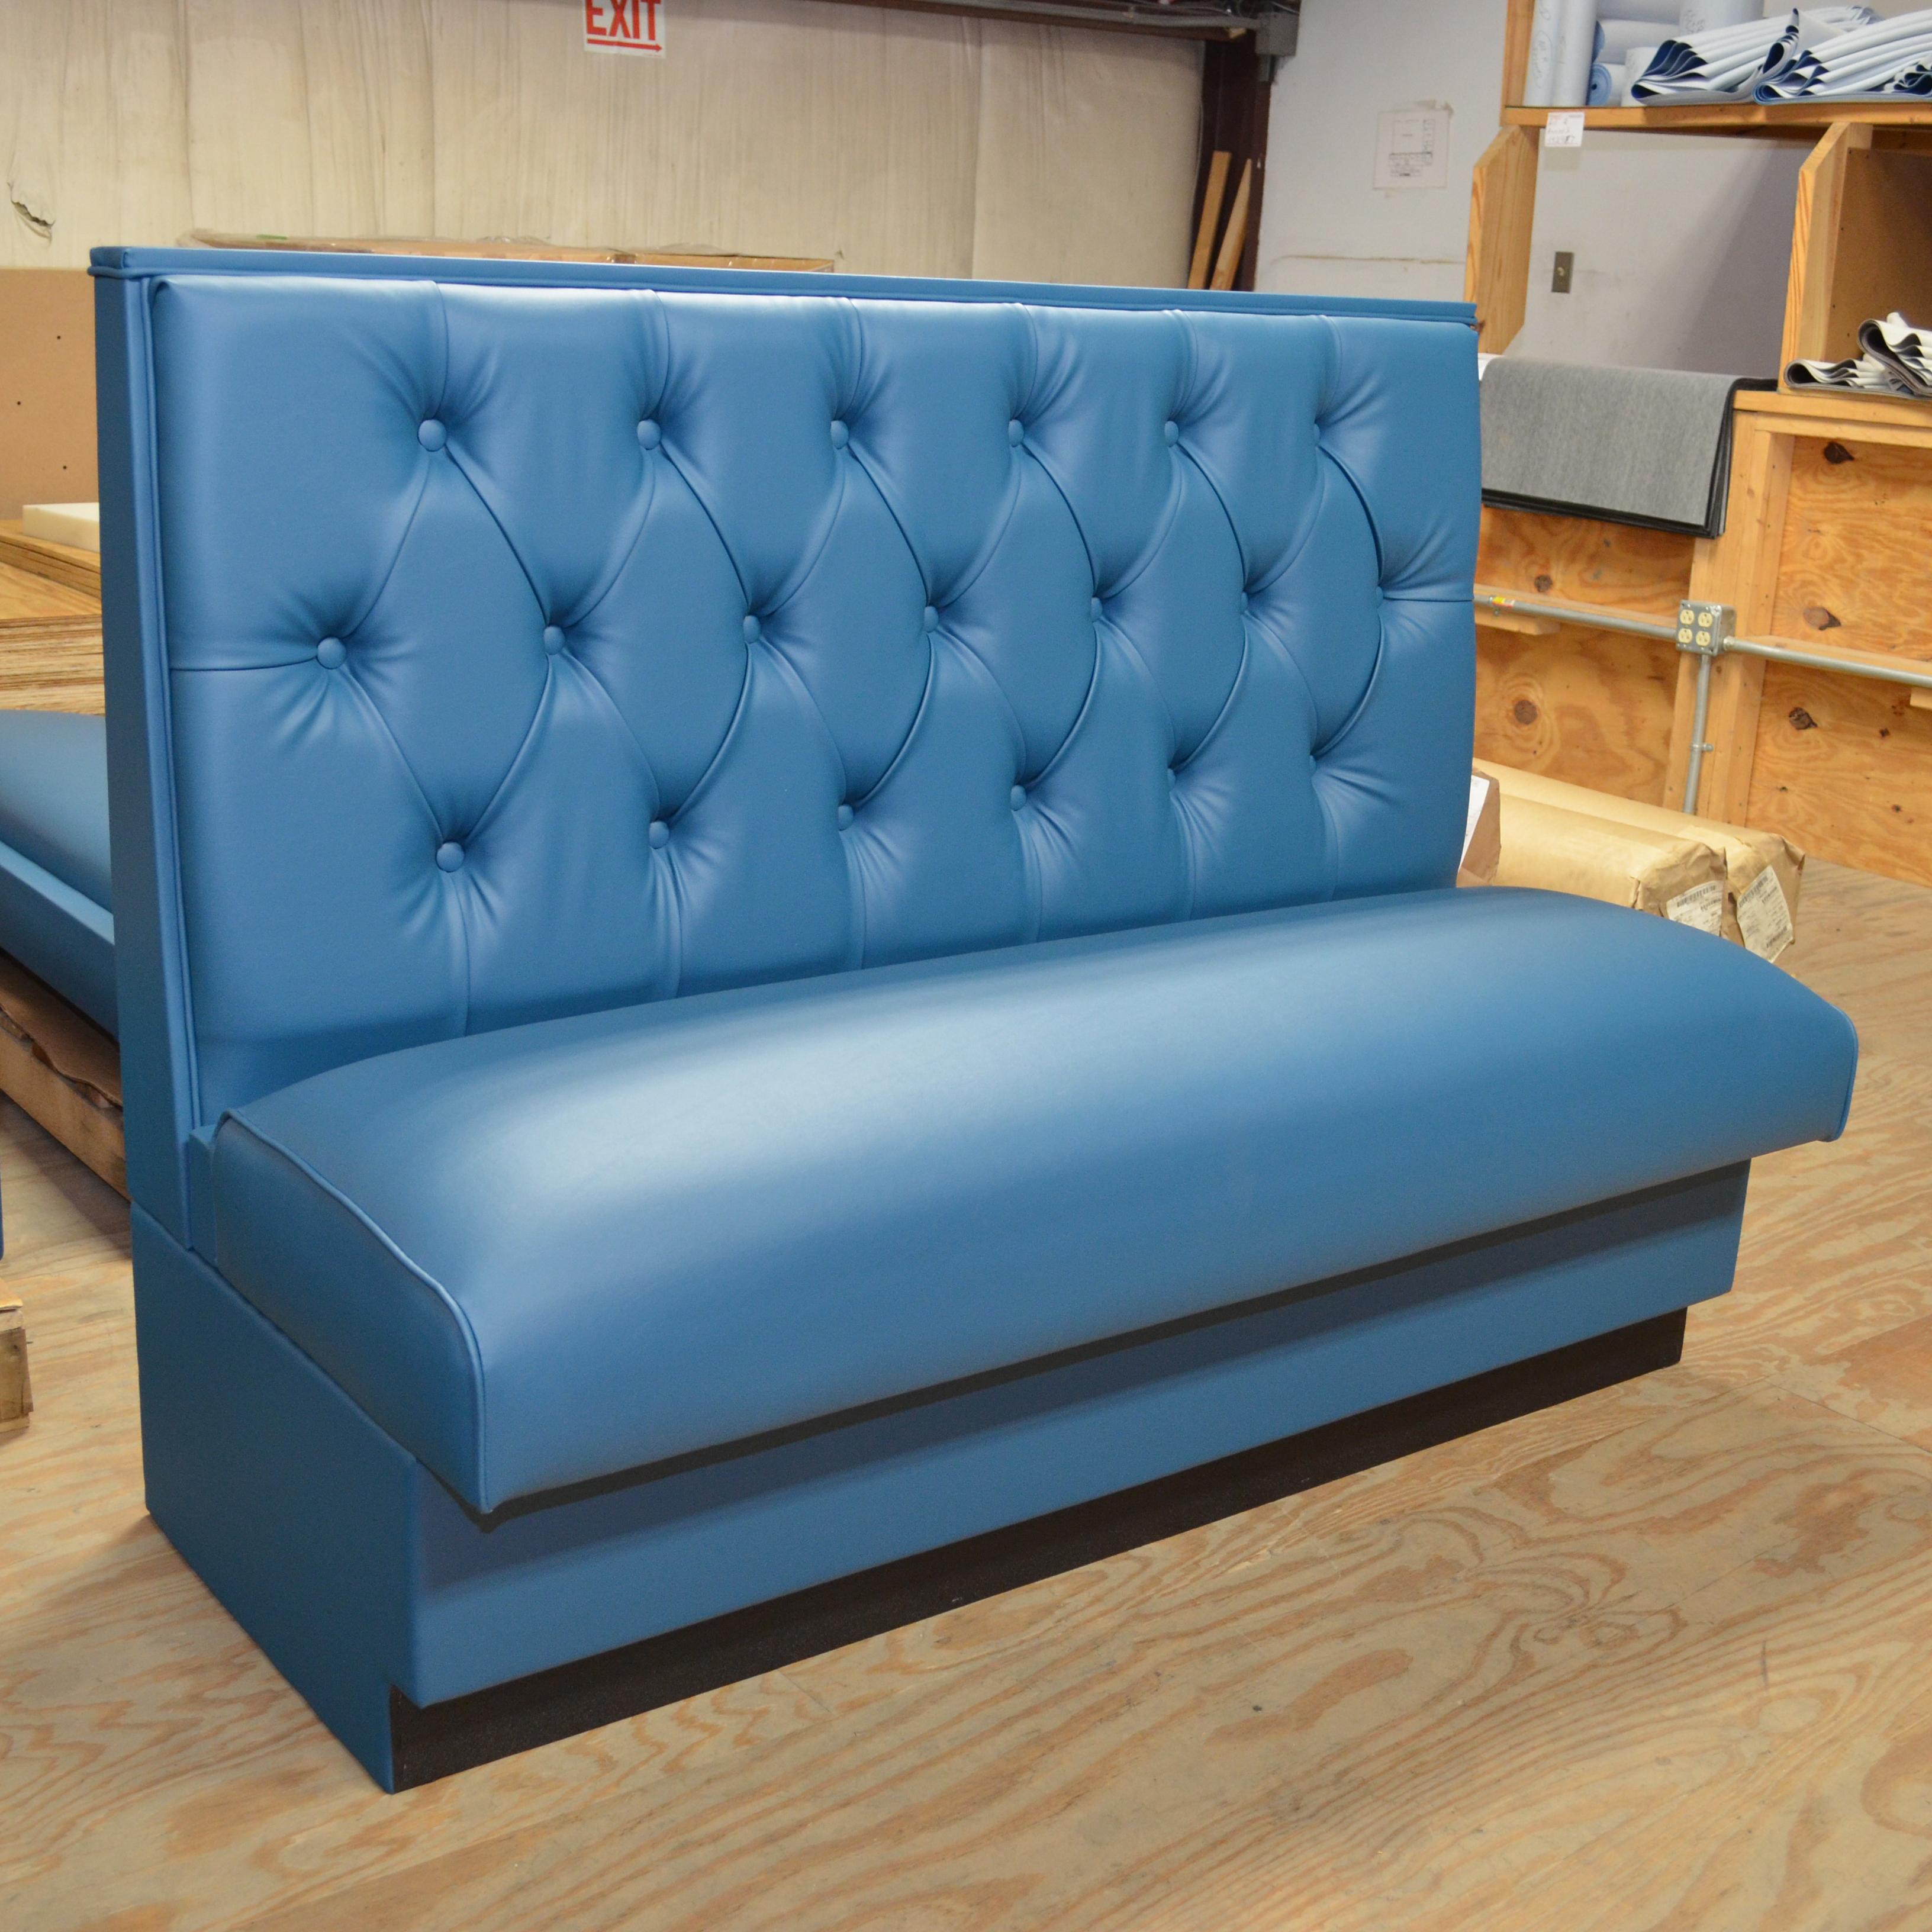 tuftedbooth-blue.jpg